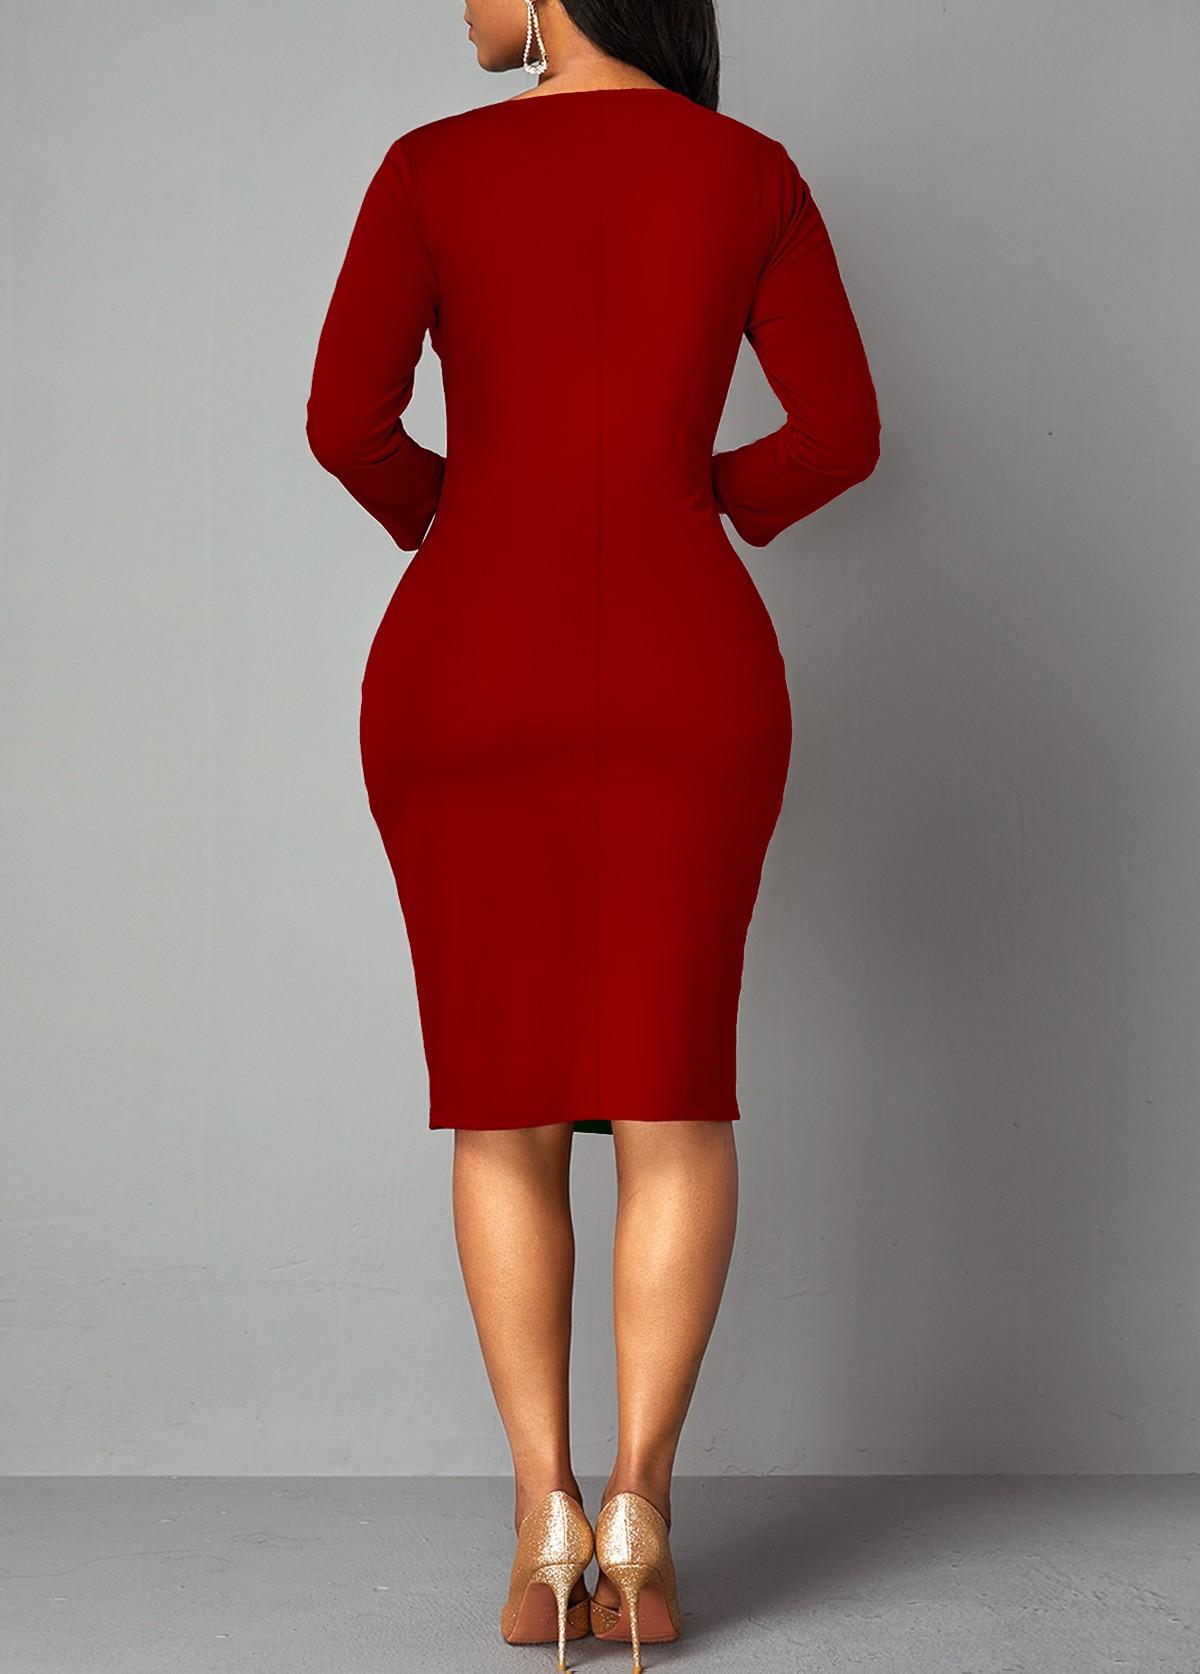 Side Slit Plaid 3/4 Sleeve Bodycon Dress